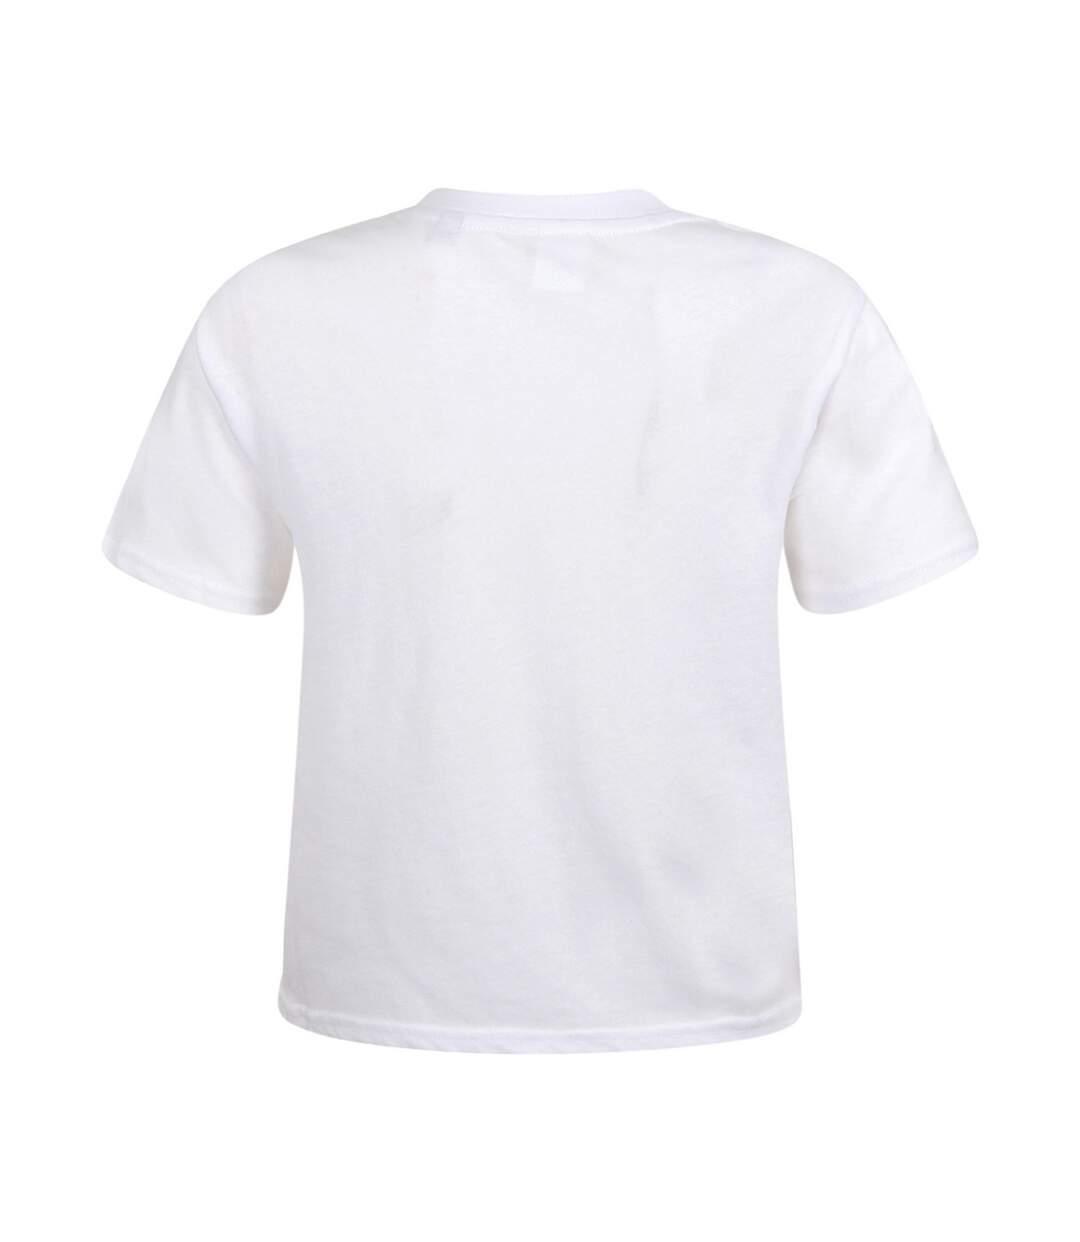 Skinni Fit - T-Shirt Court Boxy - Femme (Blanc) - UTPC3560